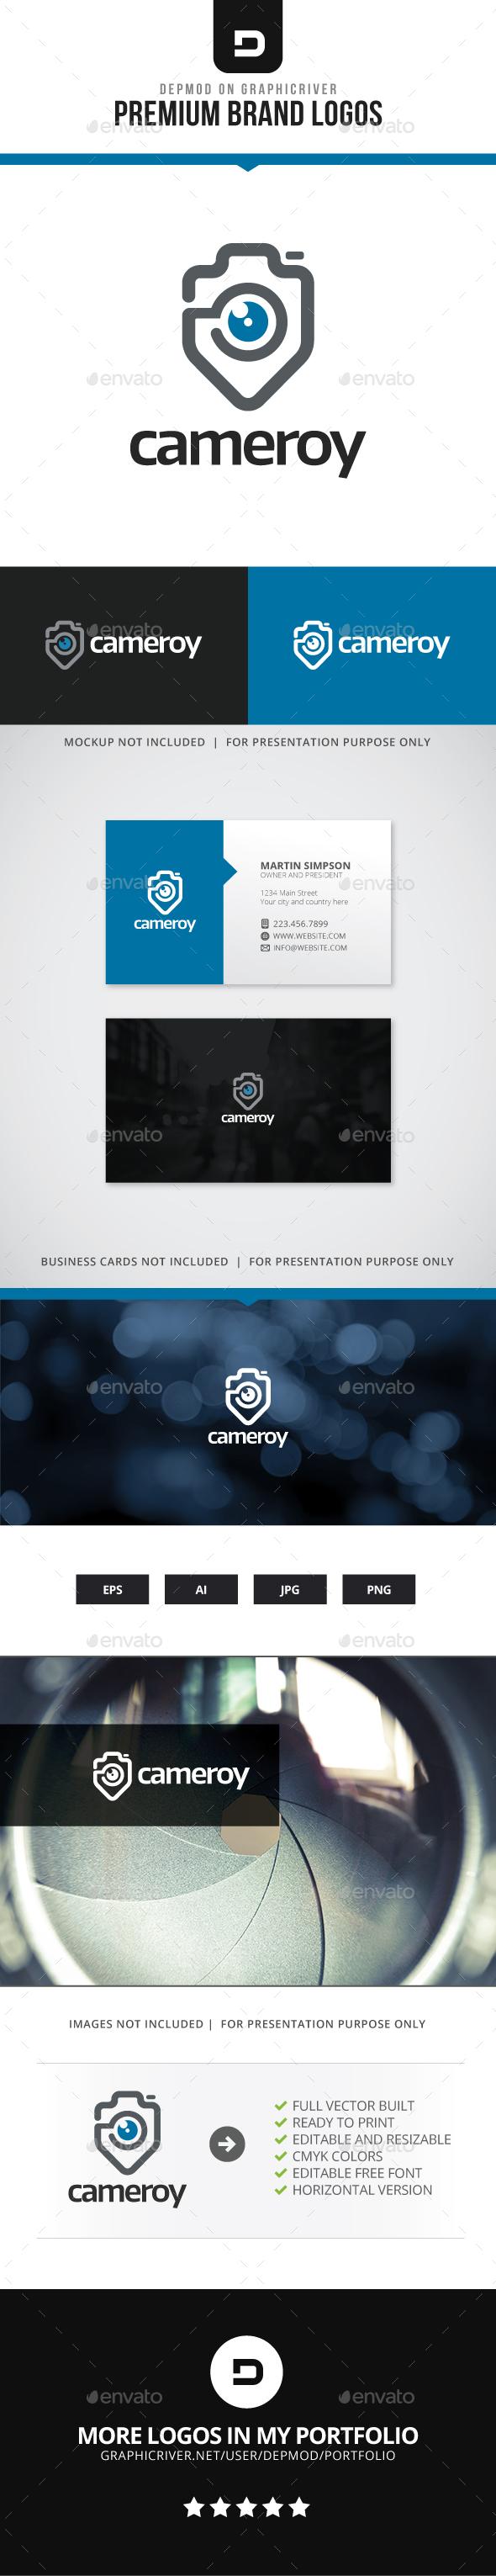 Cameroy Logo